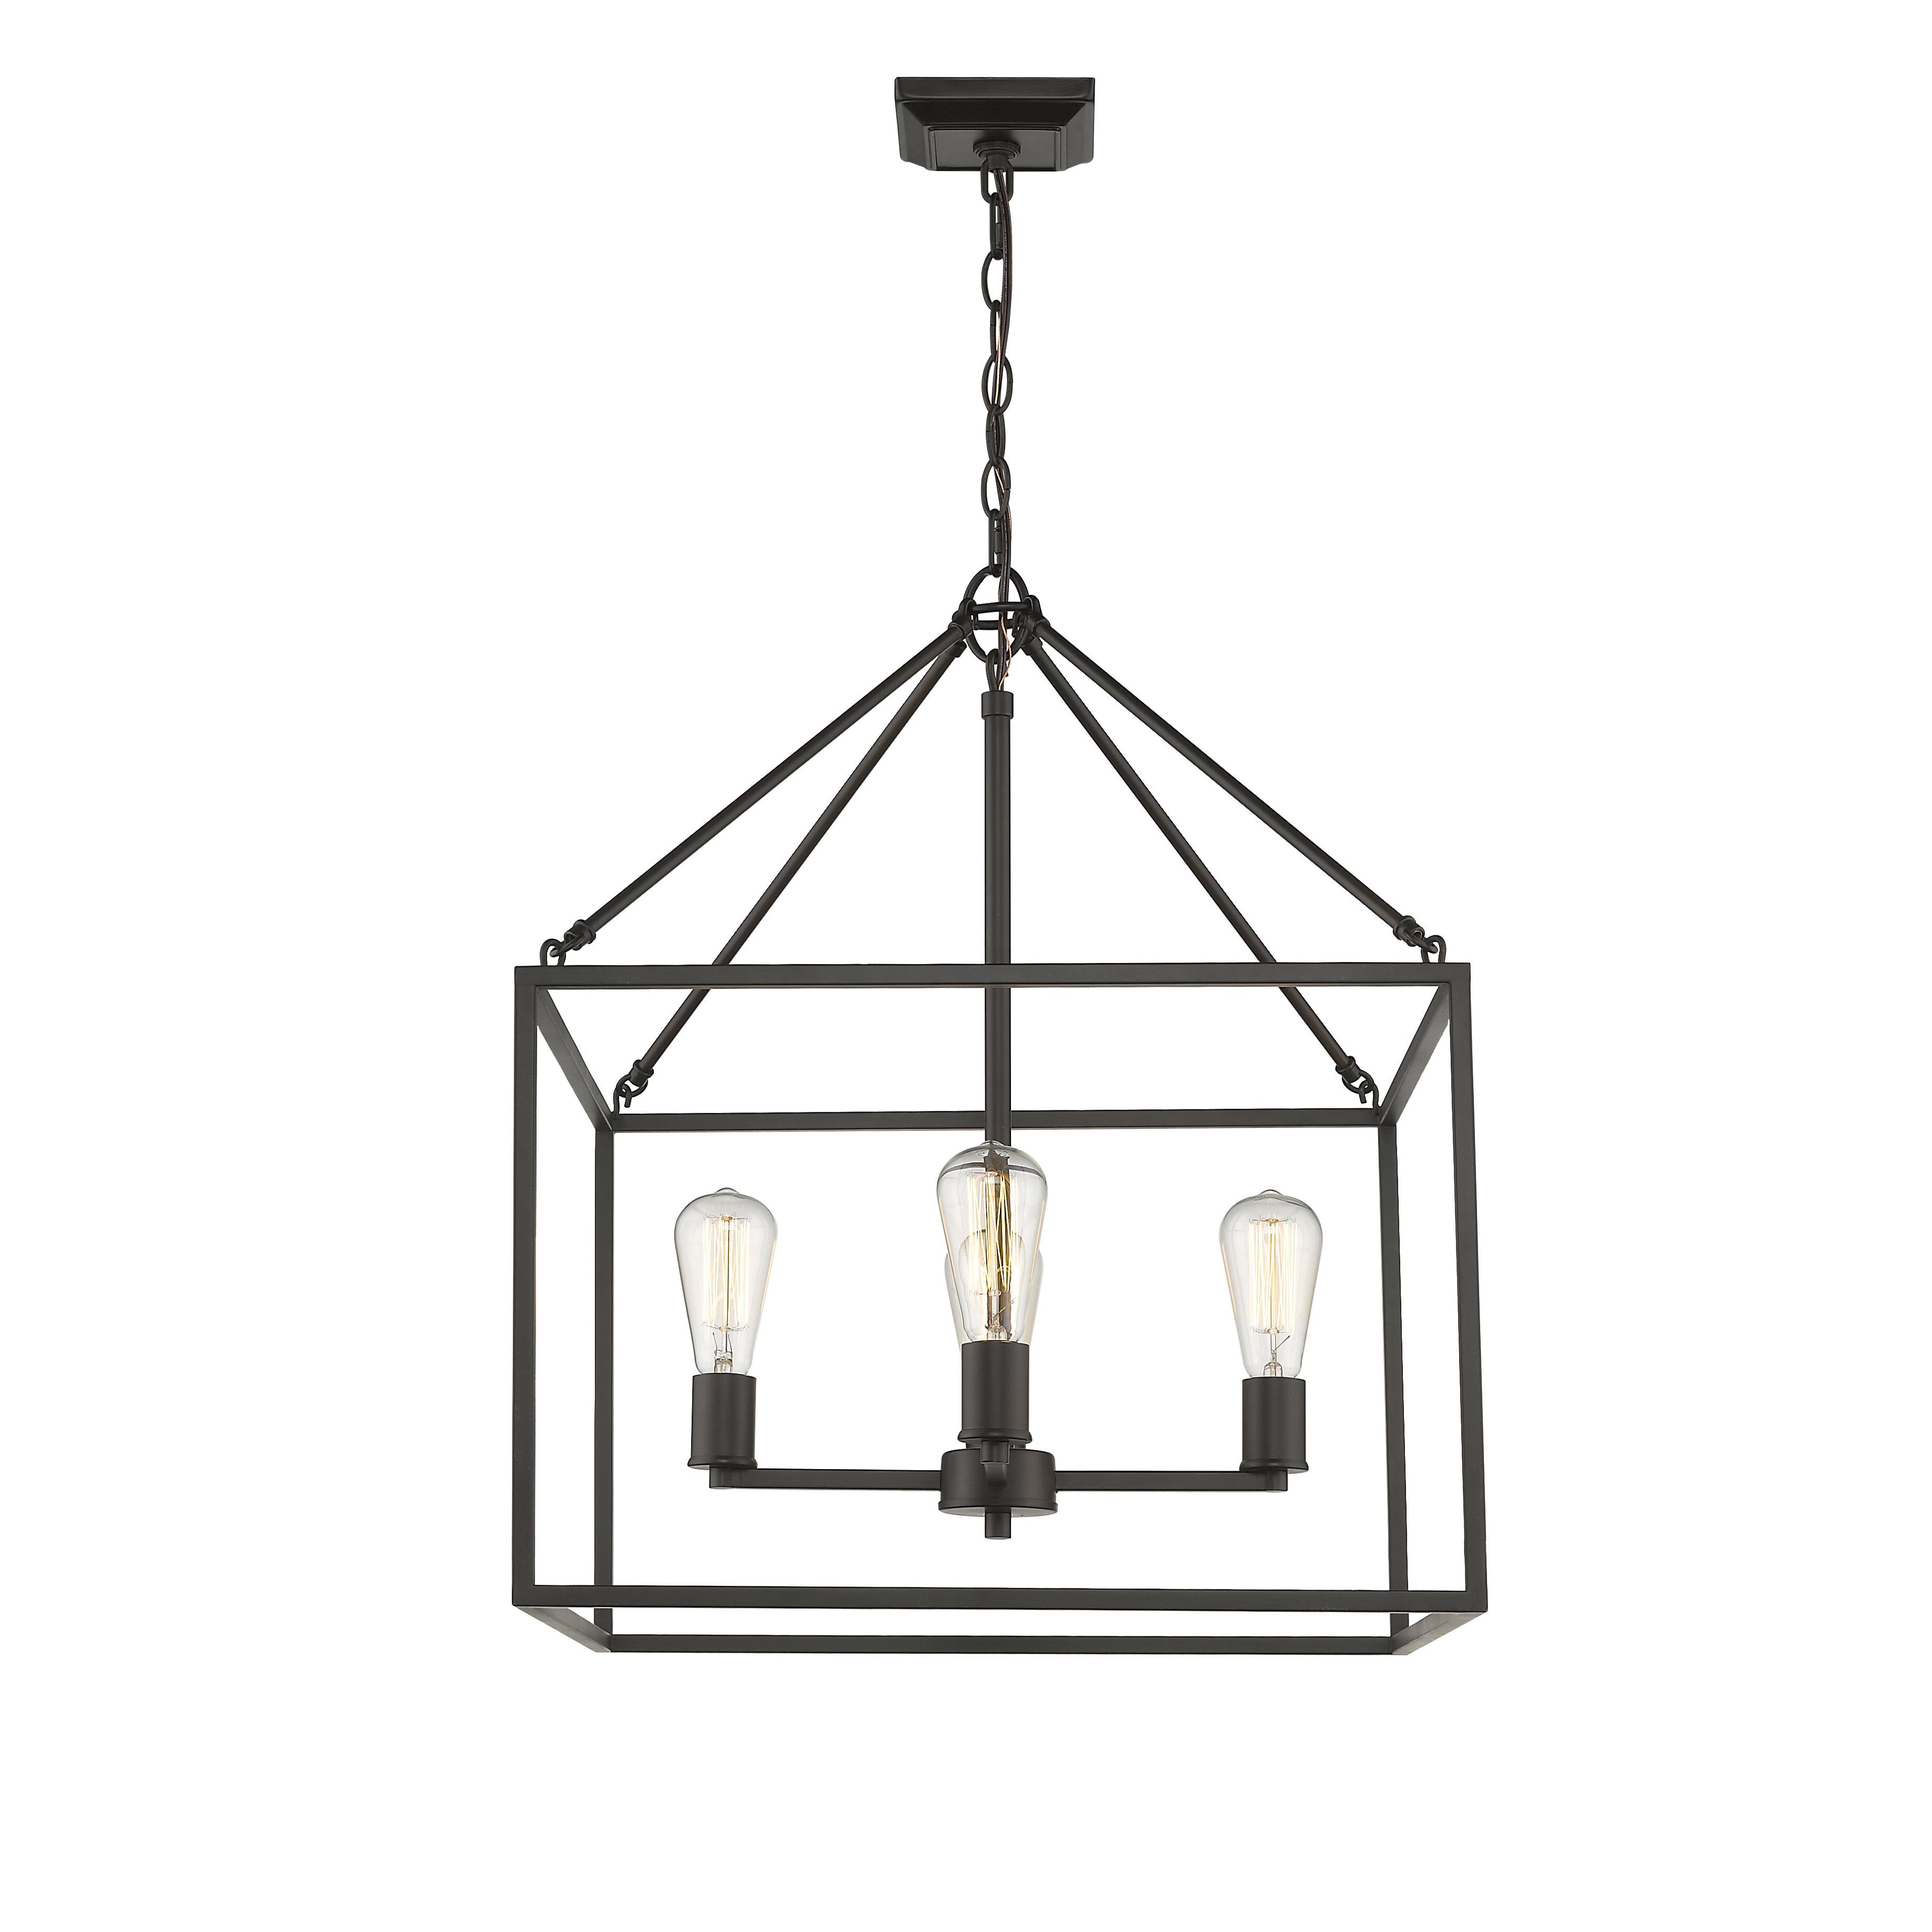 Most Recent Zabel 4 Light Lantern Square / Rectangle Pendant Inside Odie 8 Light Lantern Square / Rectangle Pendants (Gallery 11 of 20)